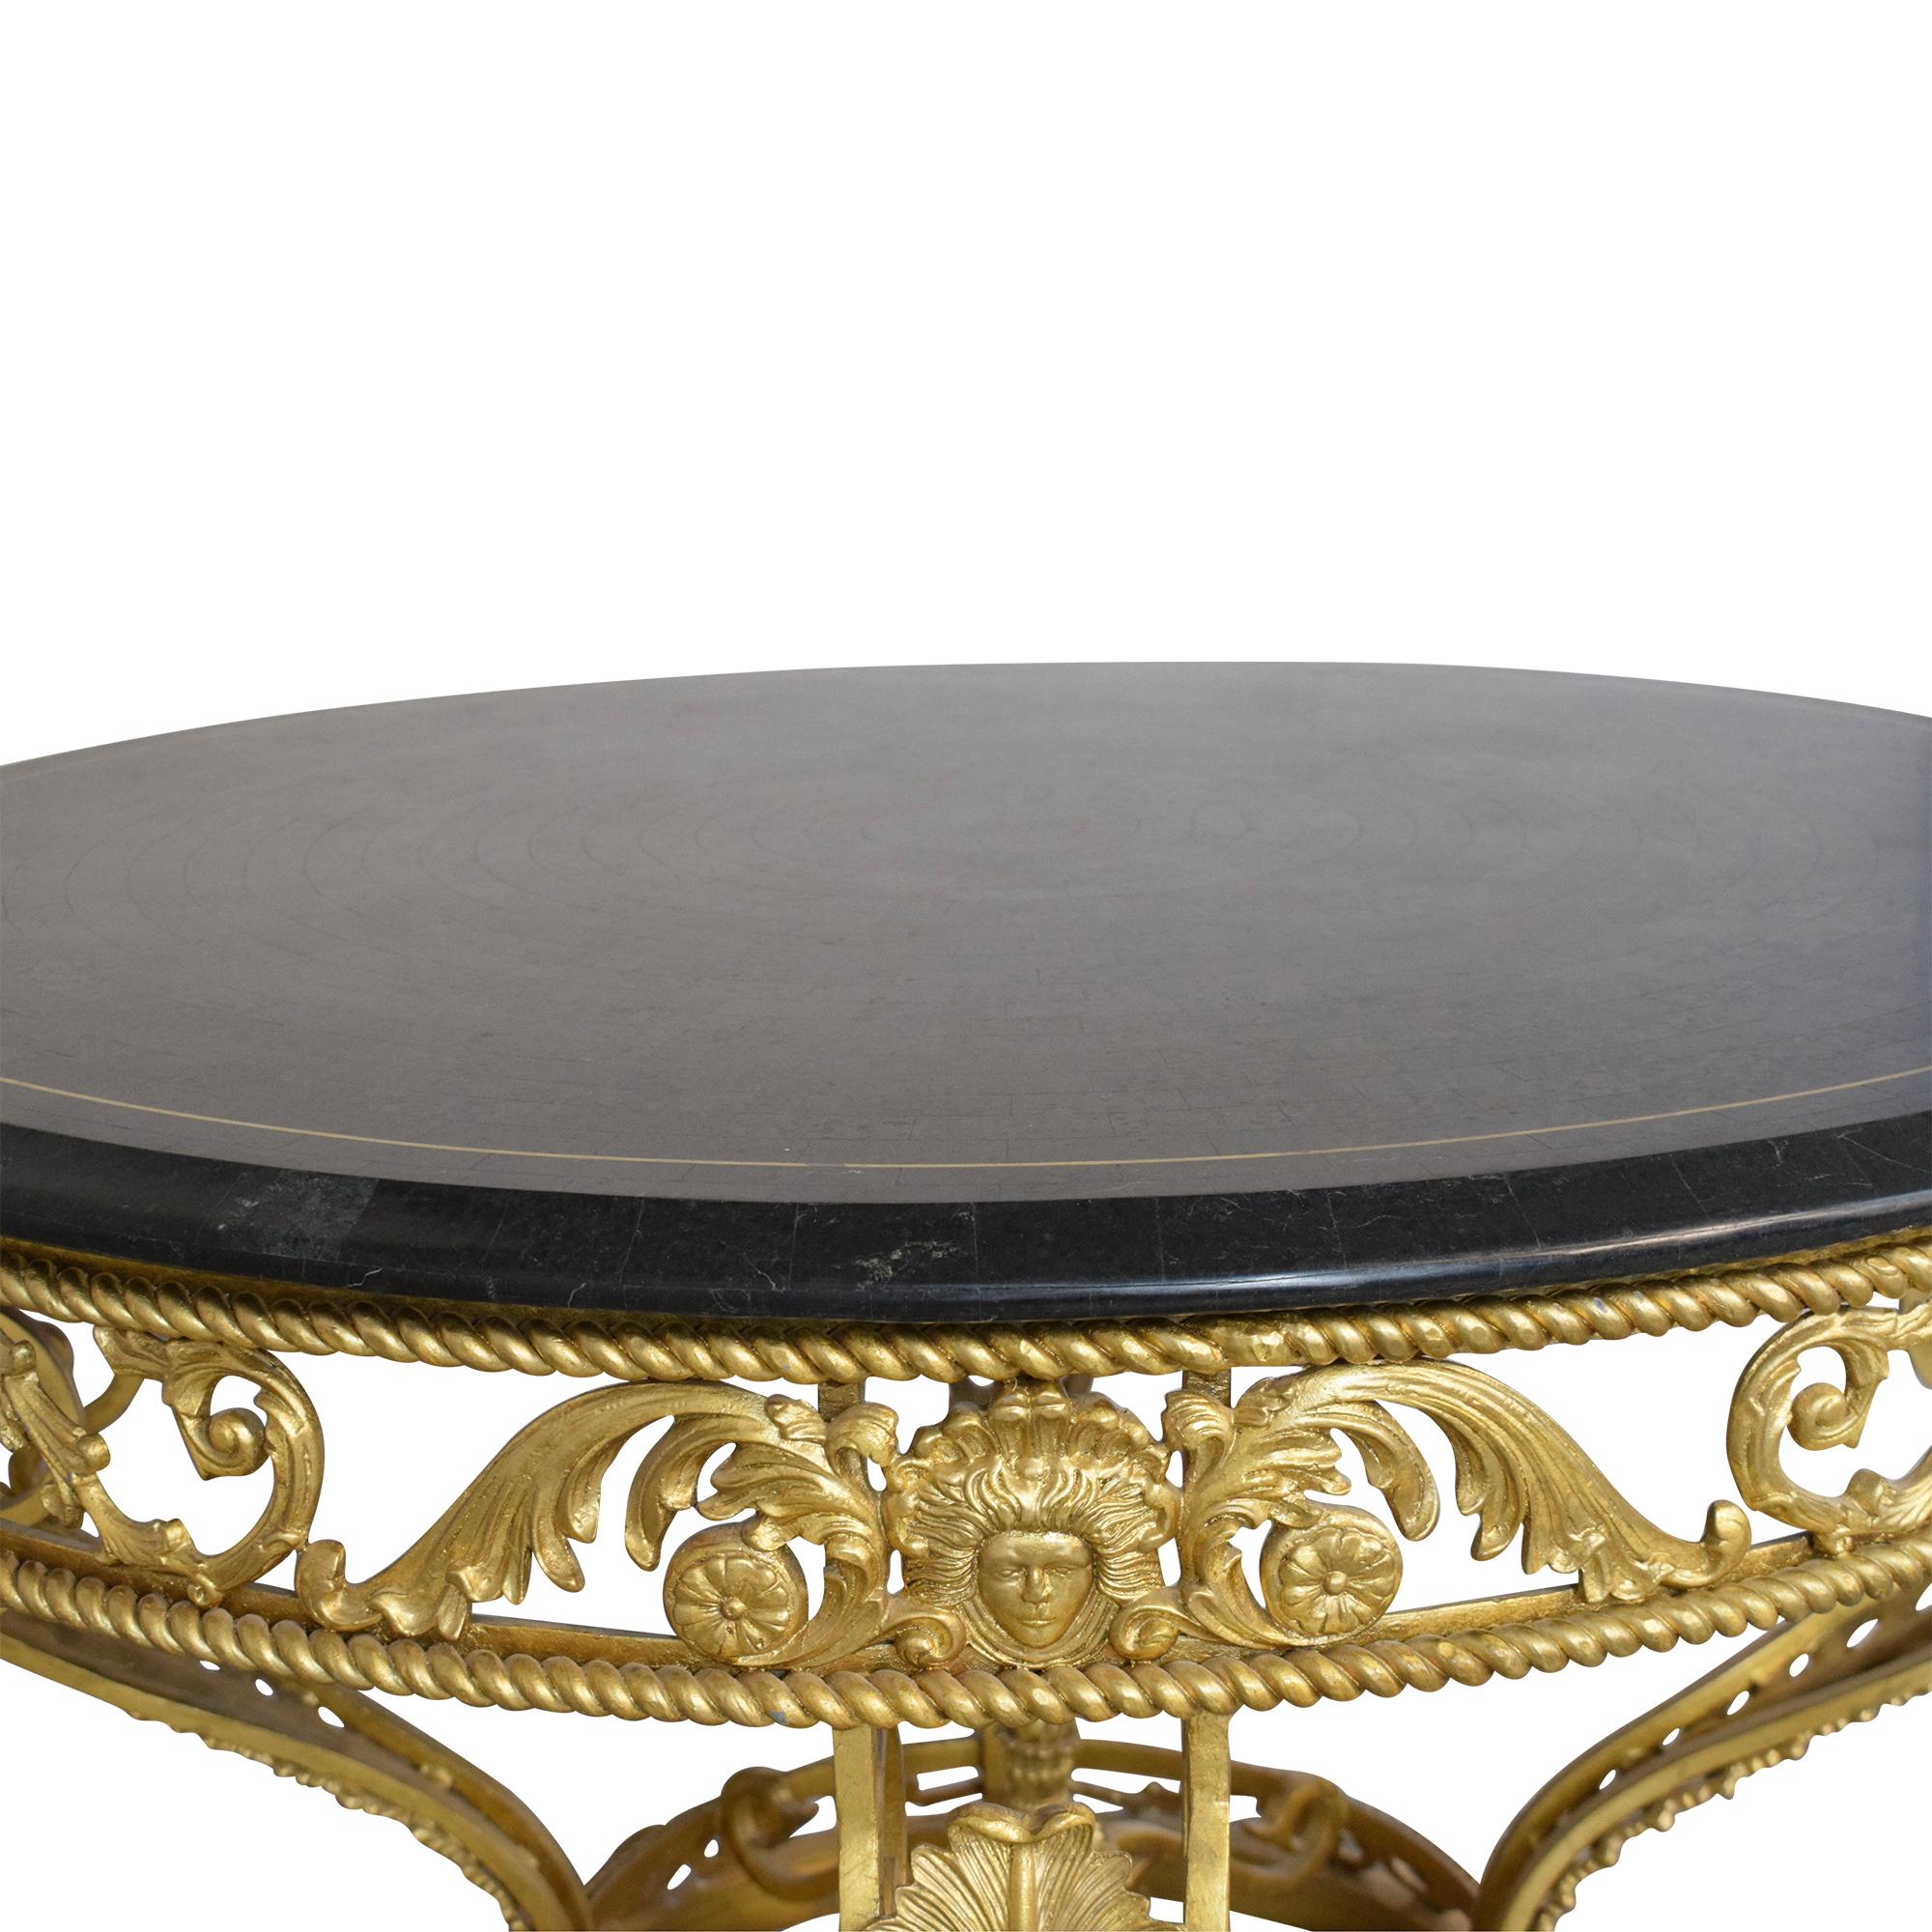 Henredon Furniture Henredon Furniture Ornate Foyer Table dimensions